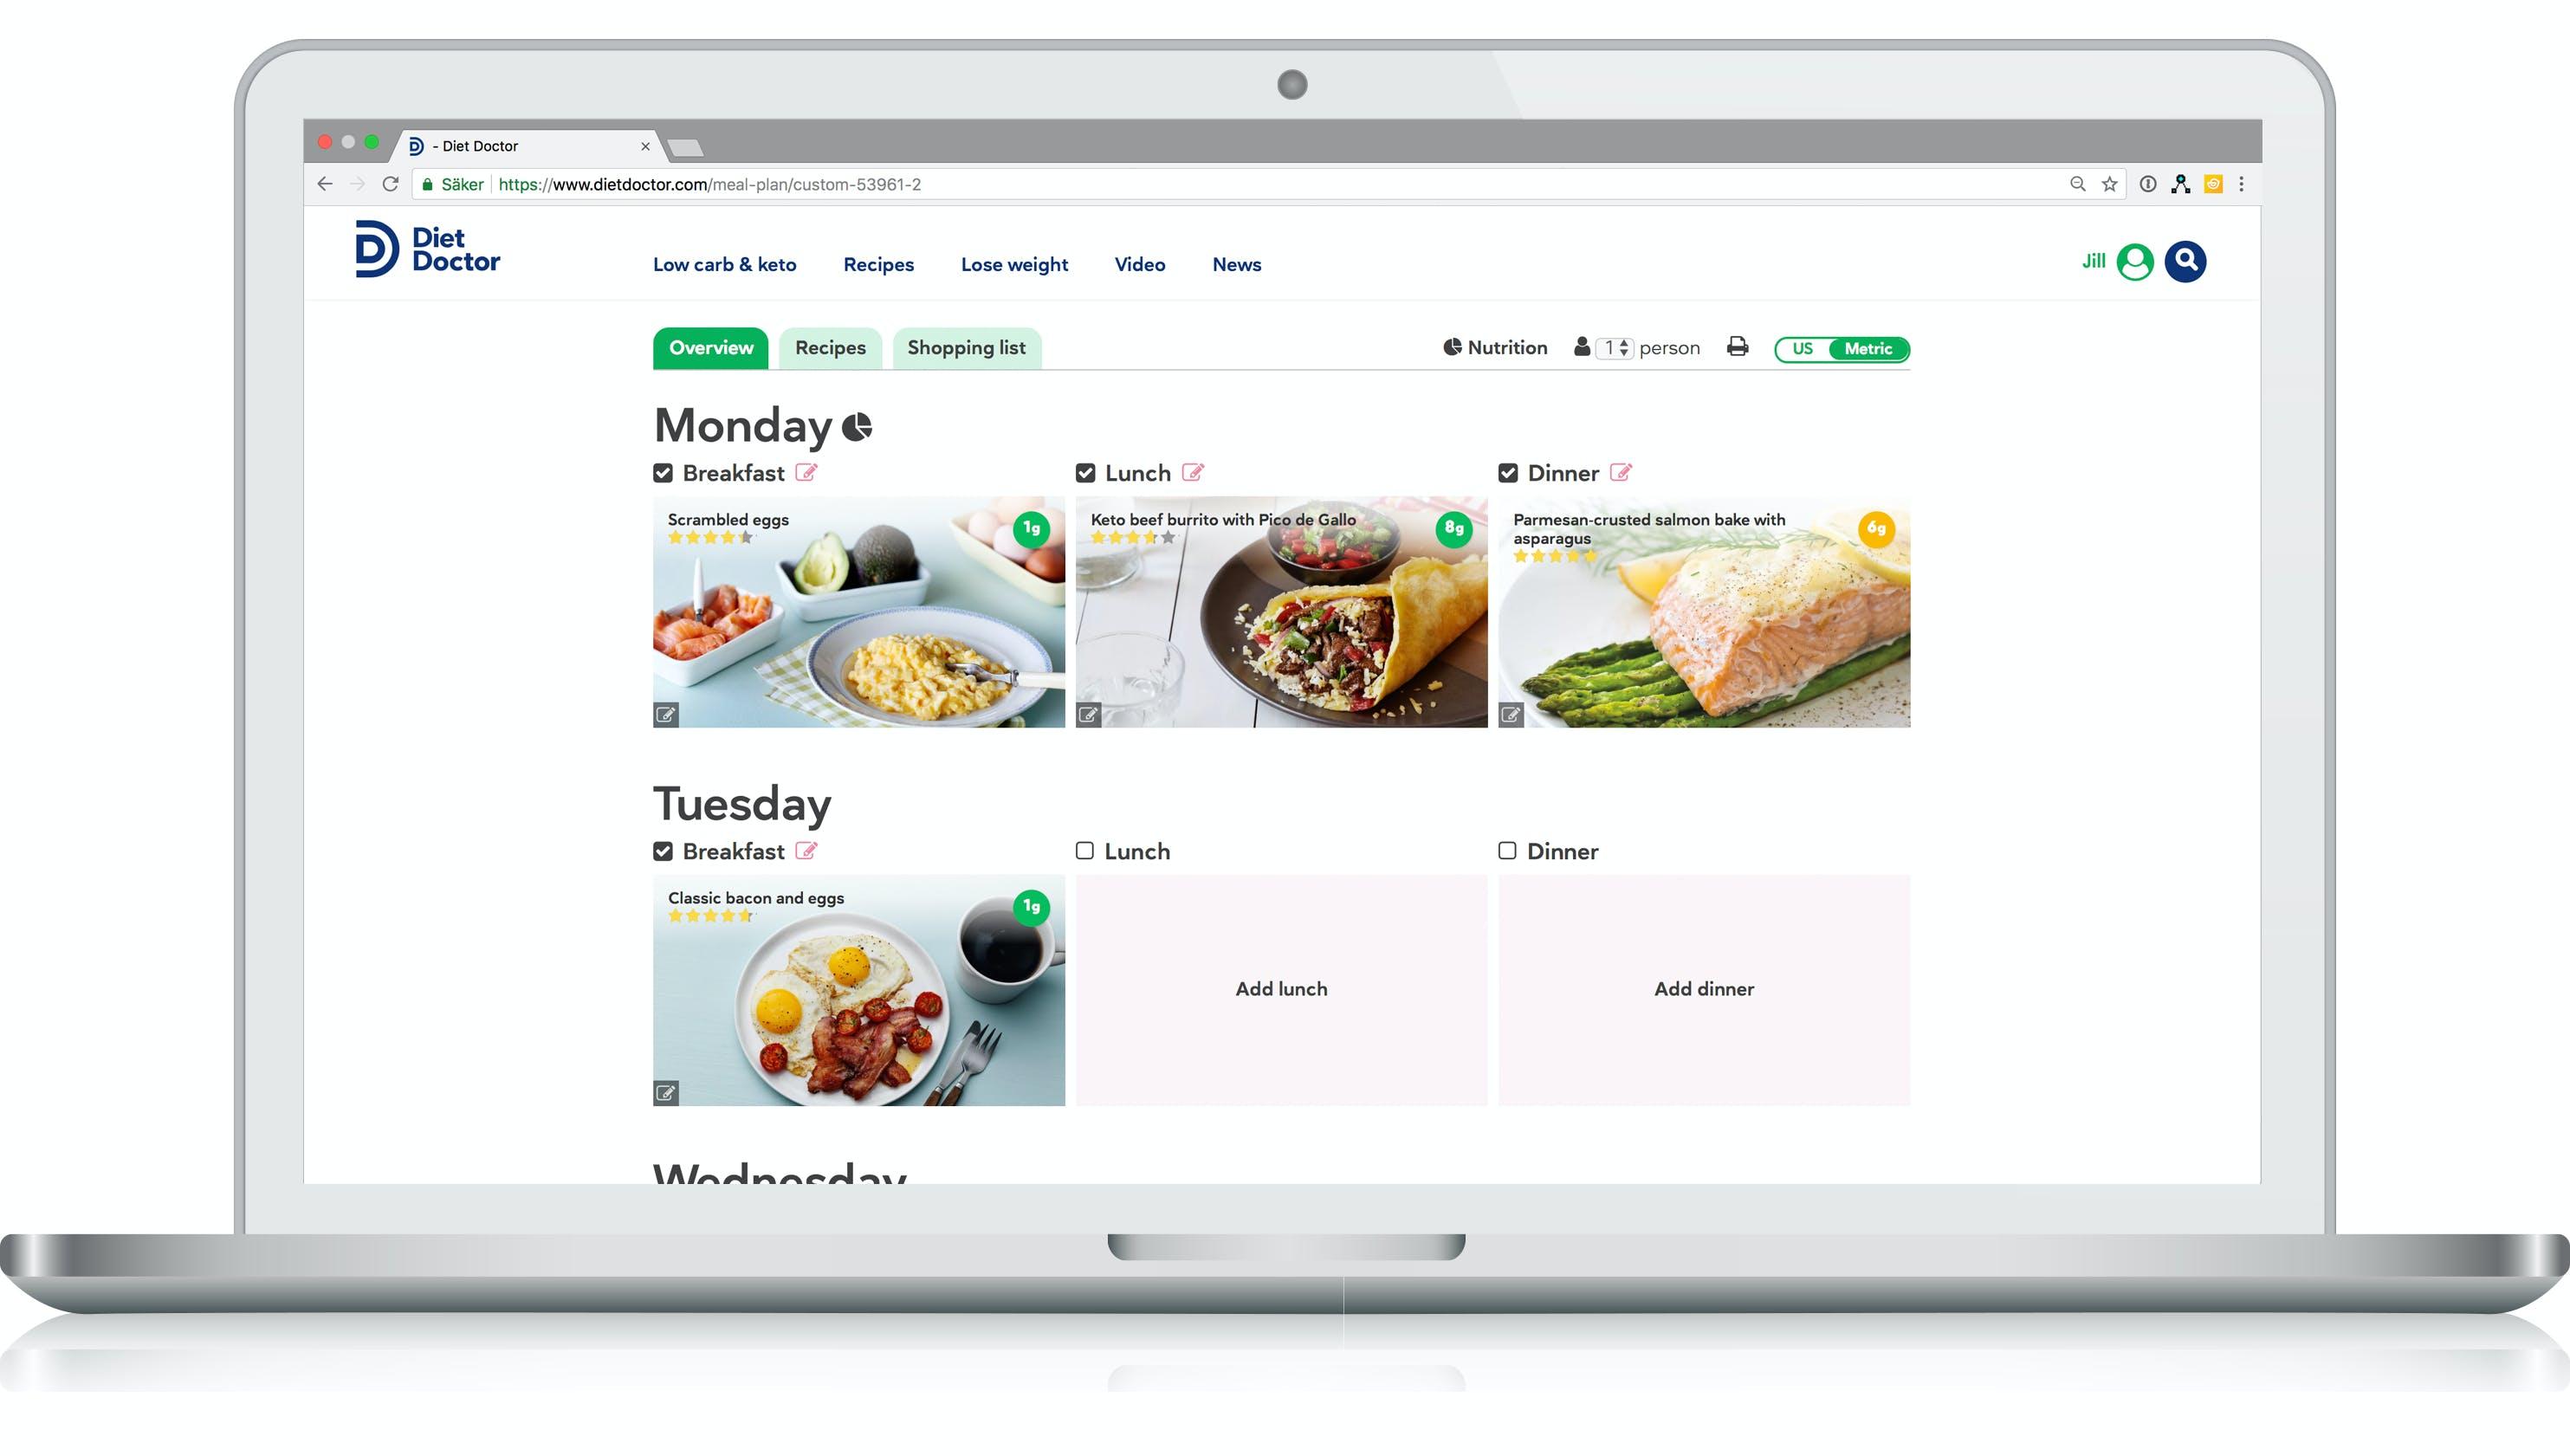 DD_keto-meal-planner-2